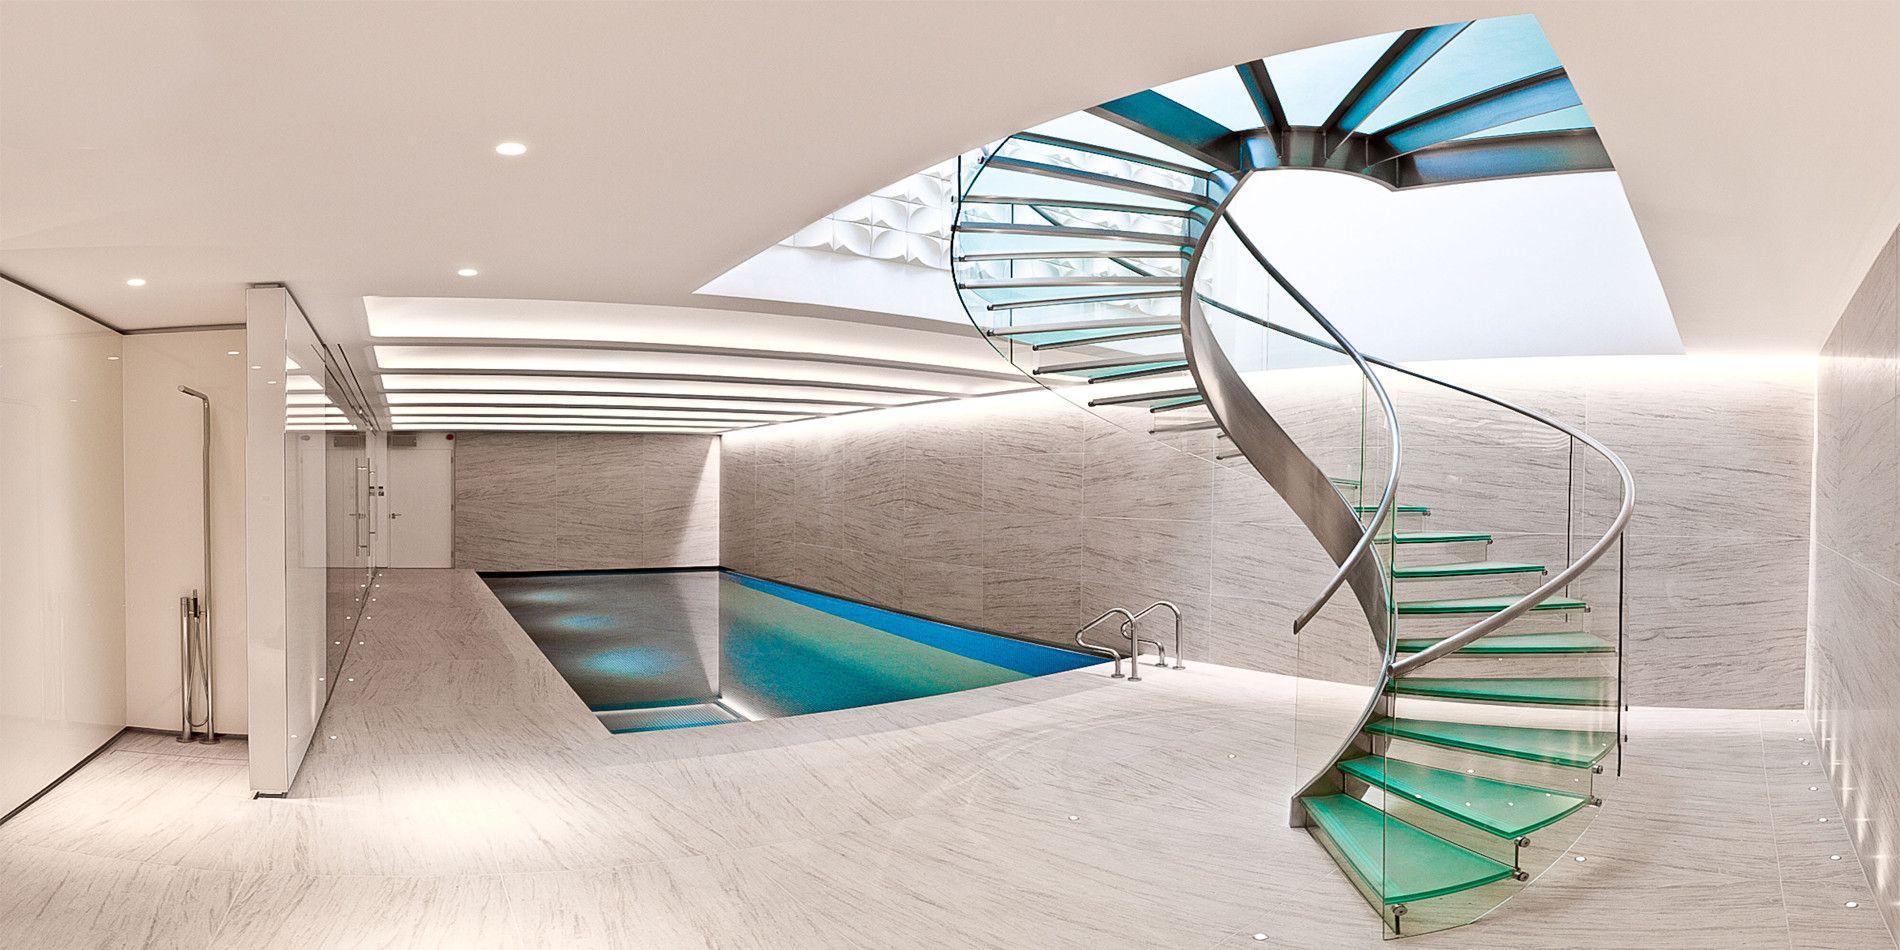 Best Kết Quả Hình Ảnh Cho Helical Stair Interior Design 400 x 300